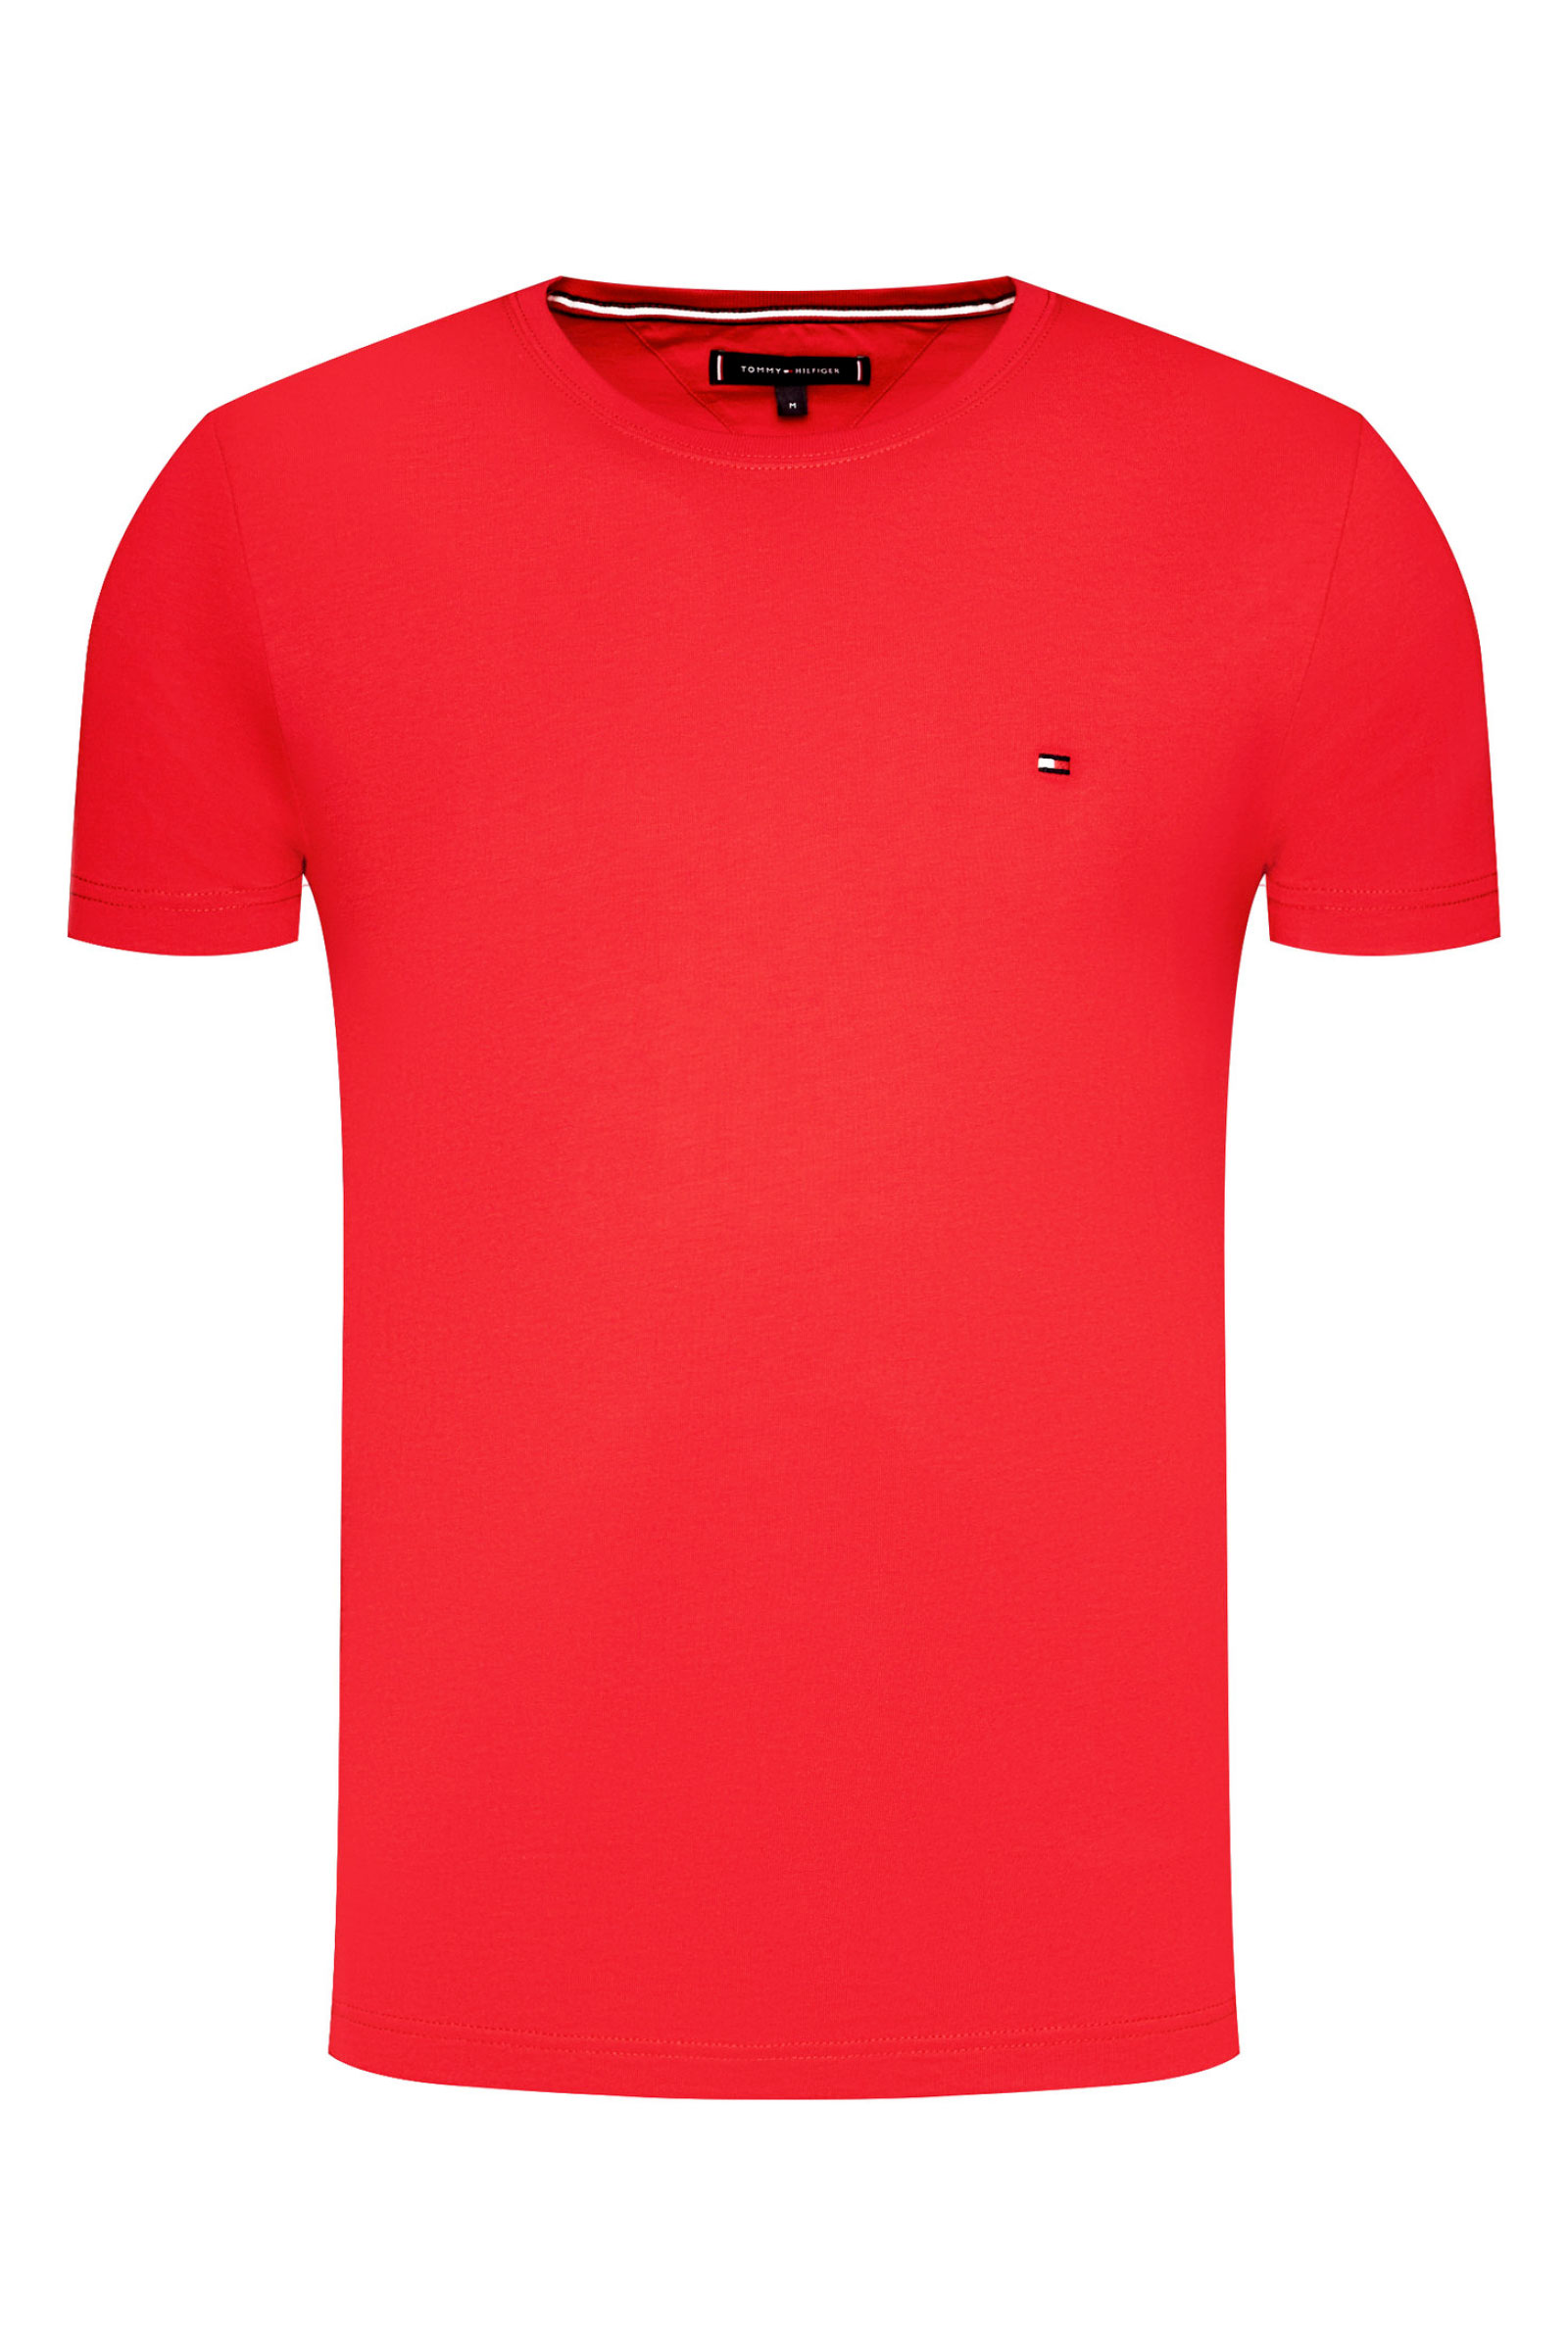 TOMMY HILFIGER | T-Shirt | MW0MW13344XLG